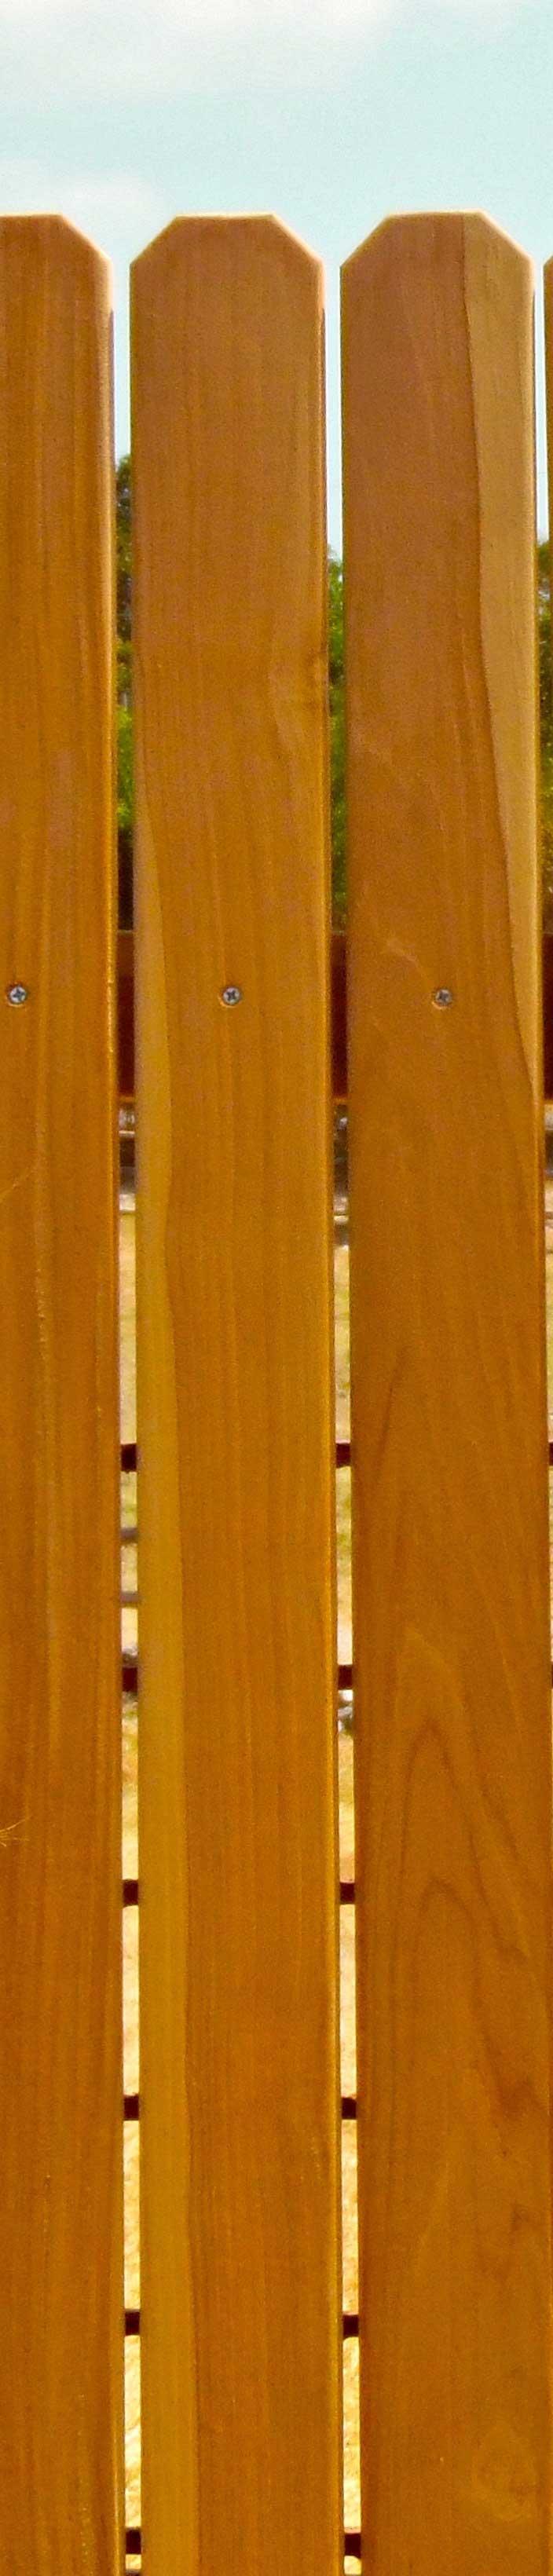 Anatomy Of Wood Fences